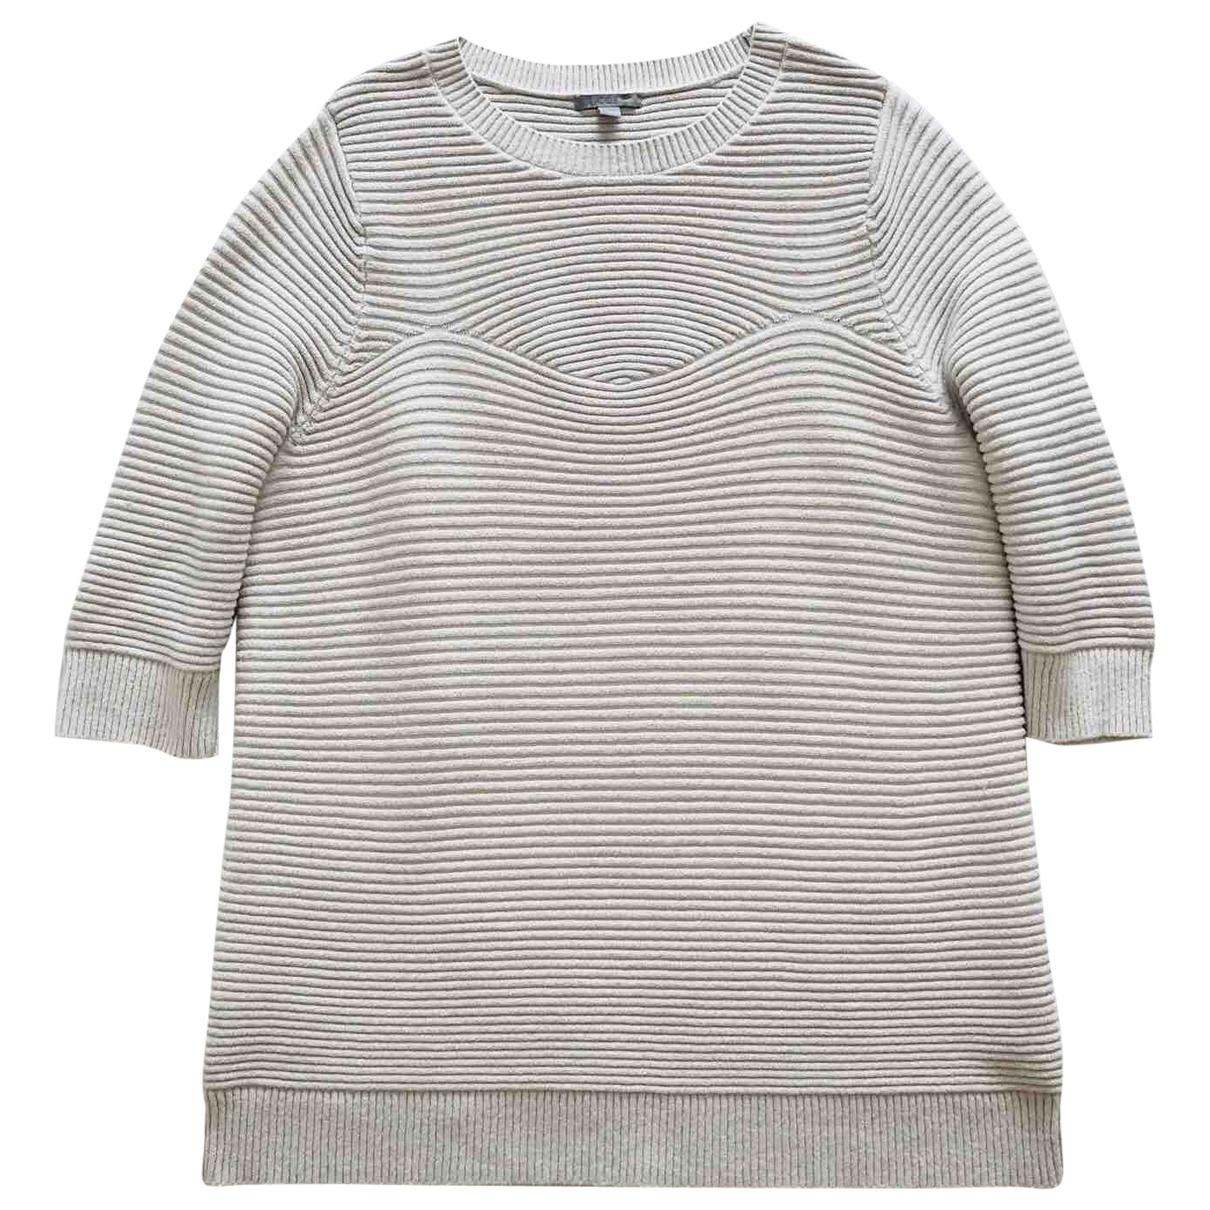 Cos \N Grey Cotton Knitwear for Women M International